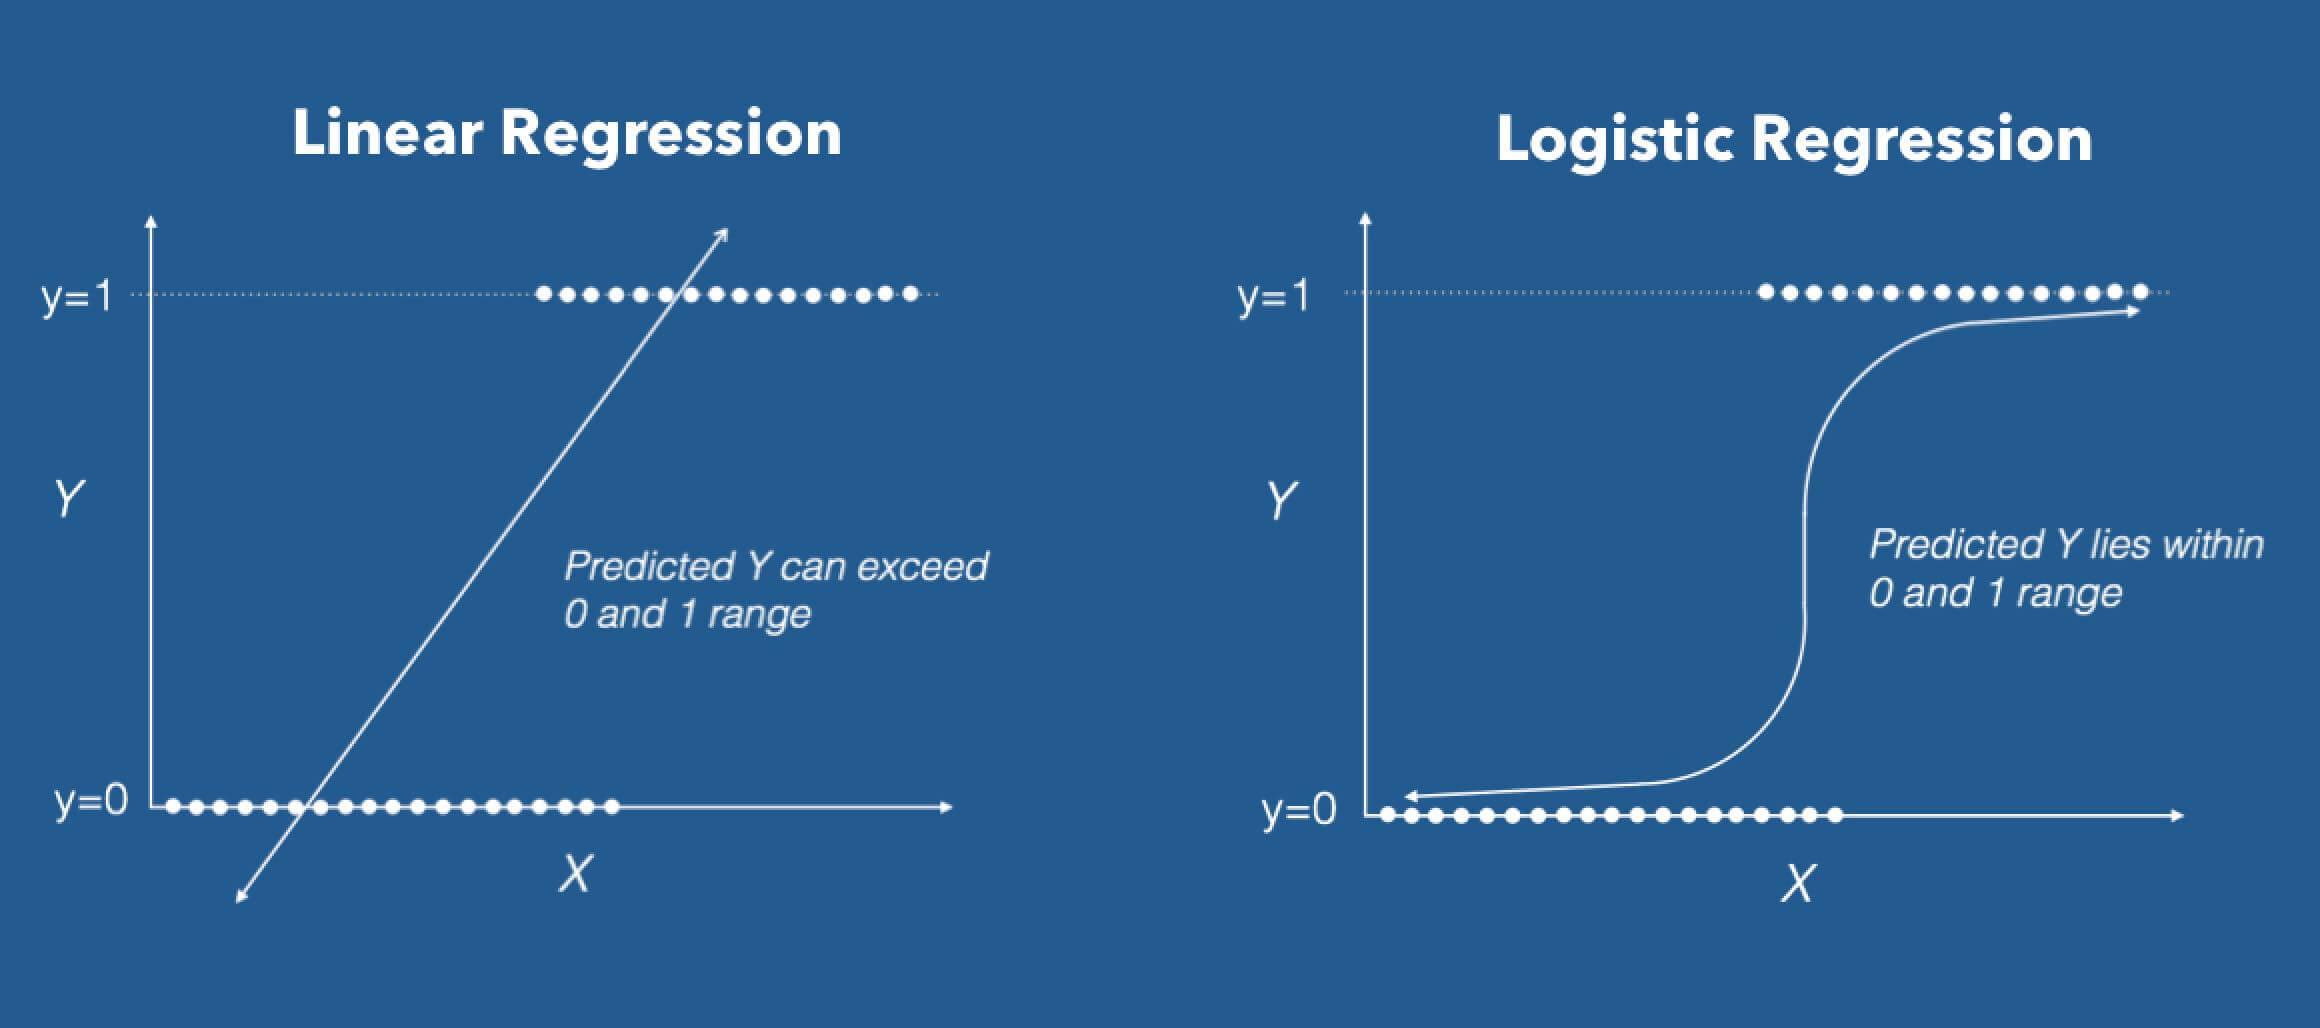 Logistic Regression in R Tutorial - DataCamp (Ed-Tech Platform)